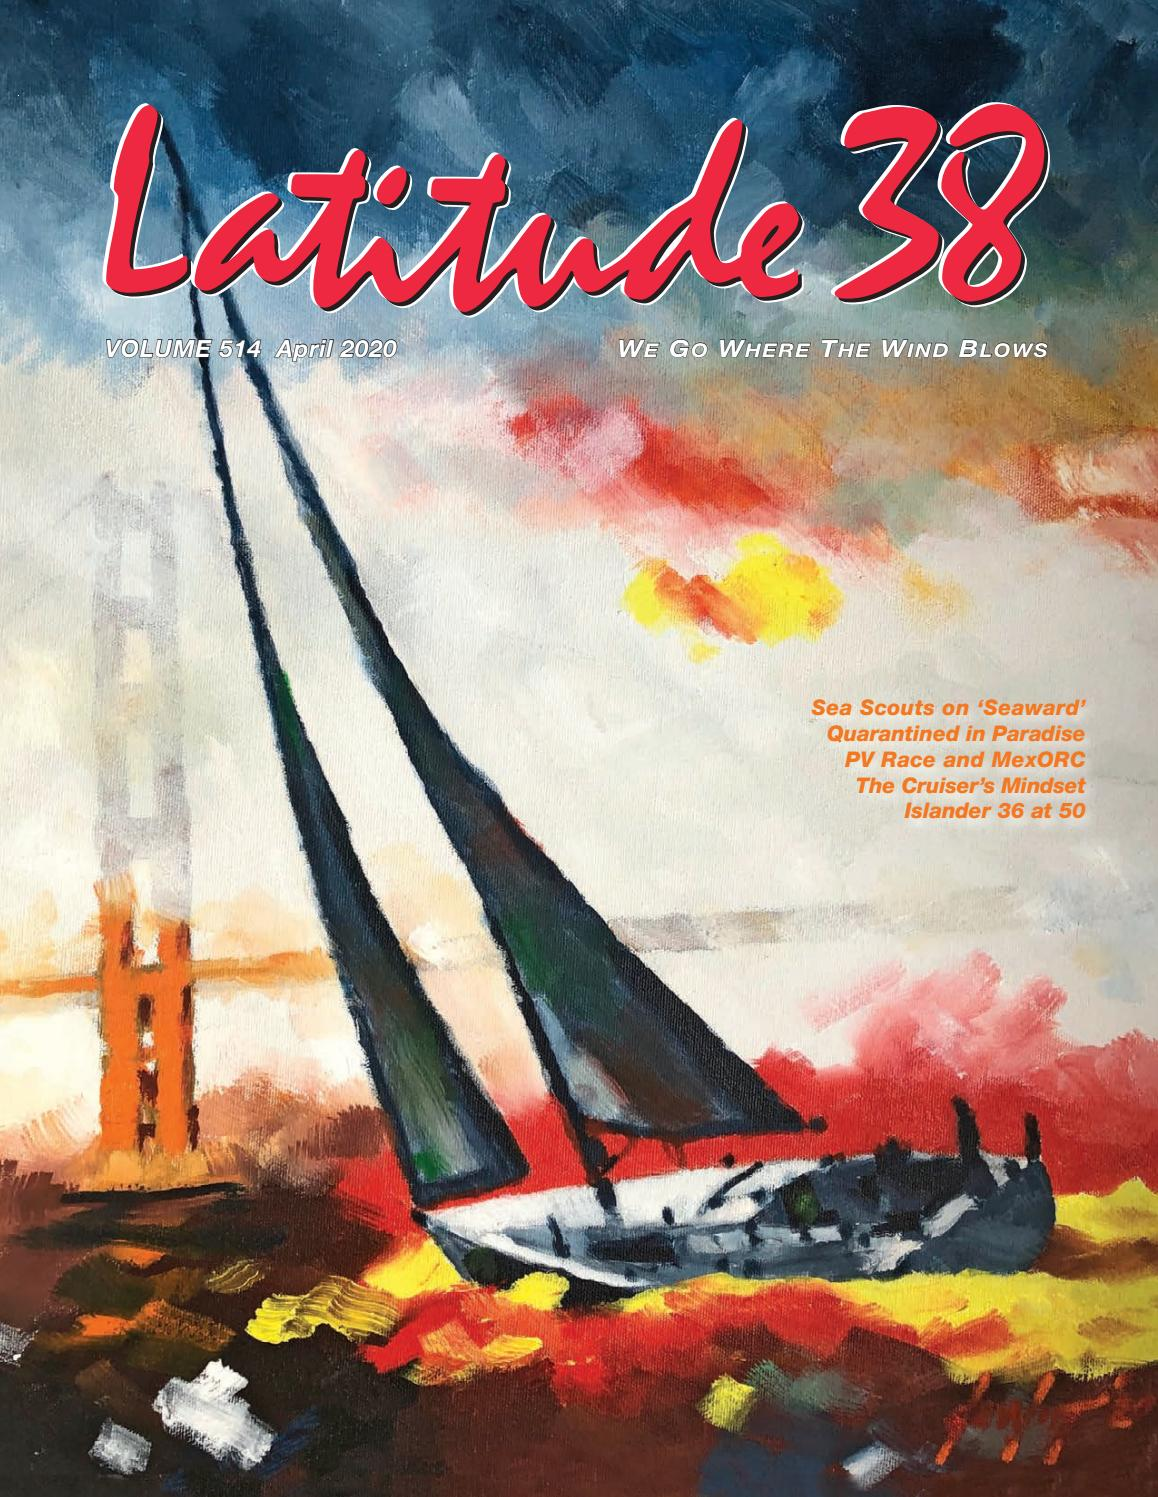 Northwest  Florida Sunset  Sailboat and Reflecting Sun  FL   Chrome  Postcard